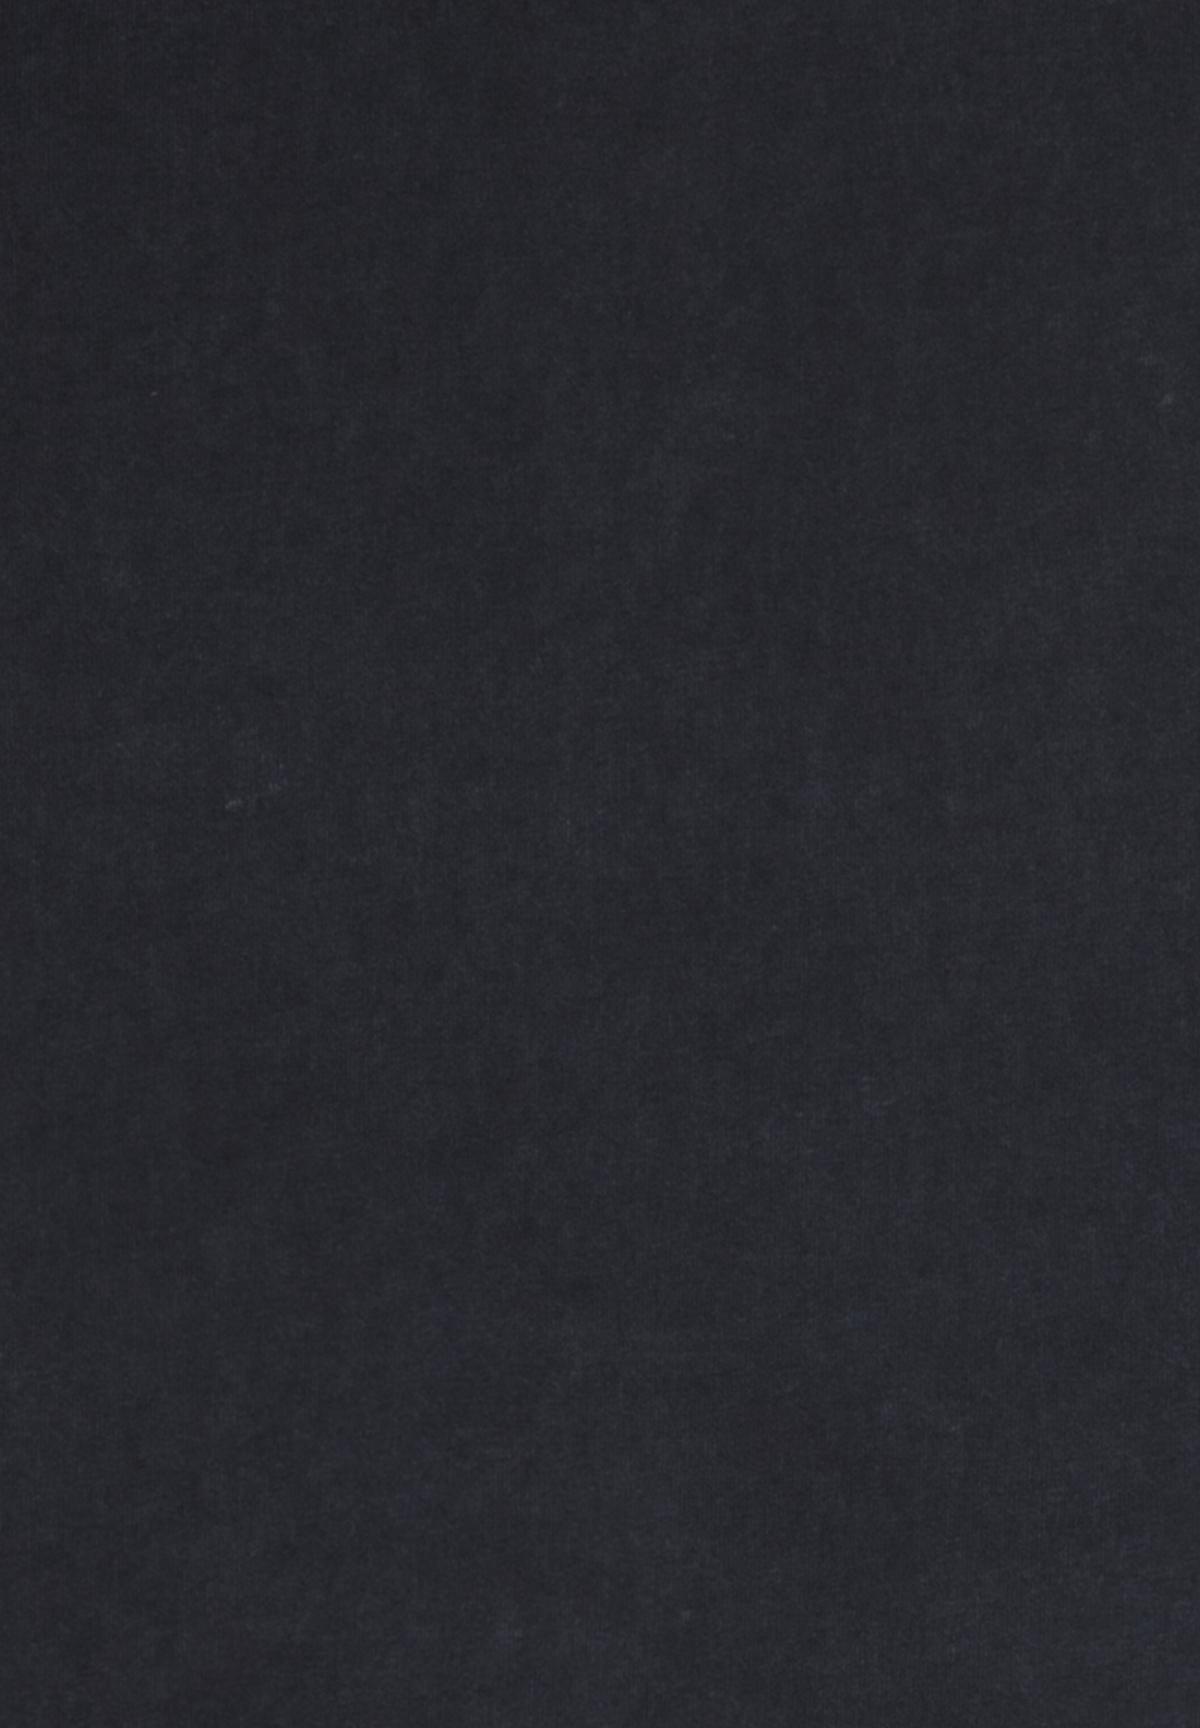 Camel-Active-Herren-Shirt-Poloshirt-Pique-Regular-Fit-NEU Indexbild 46